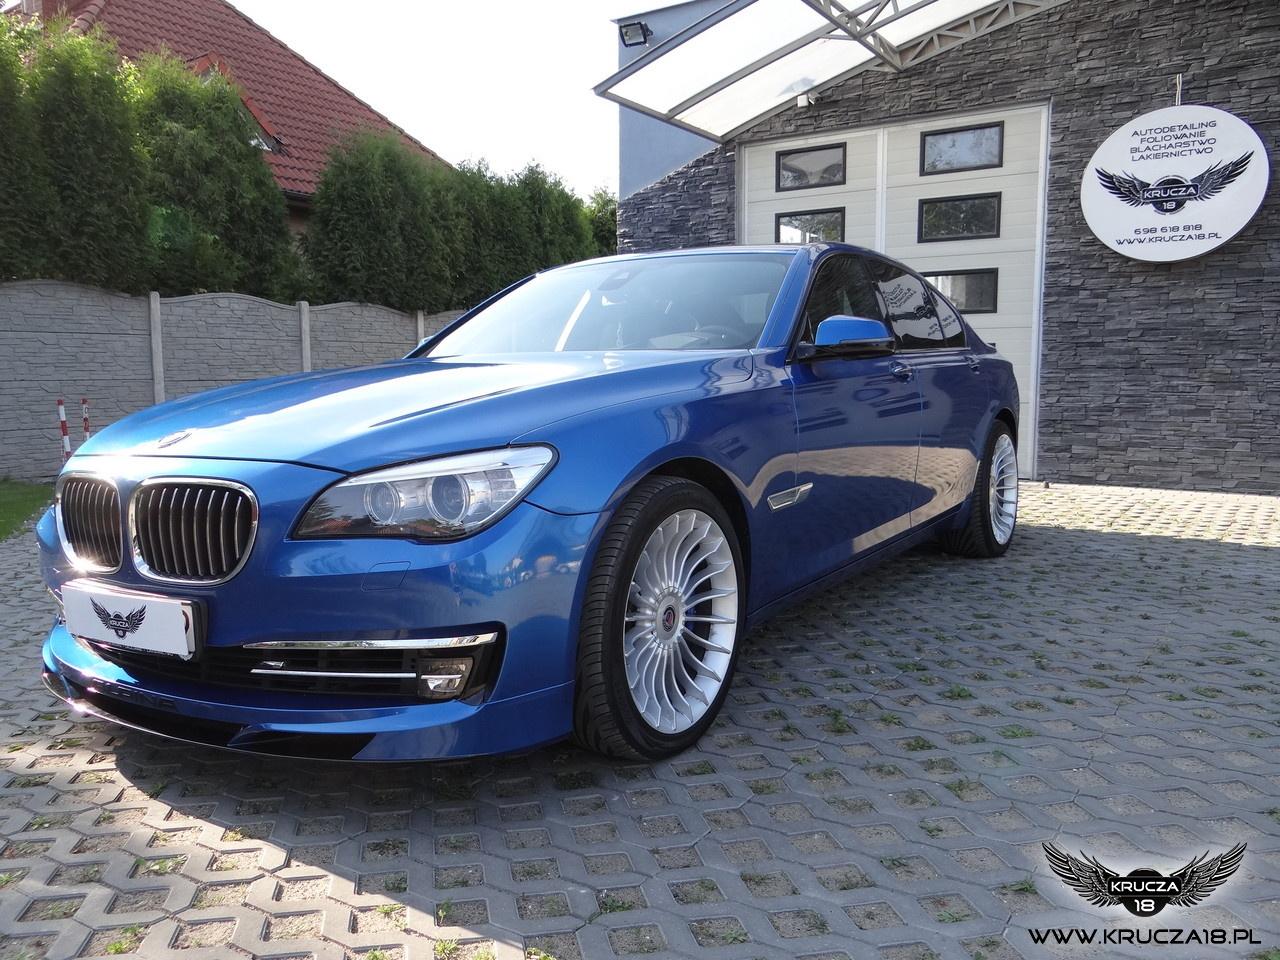 BMW 7 - Alpina B7 - Blue Metallic